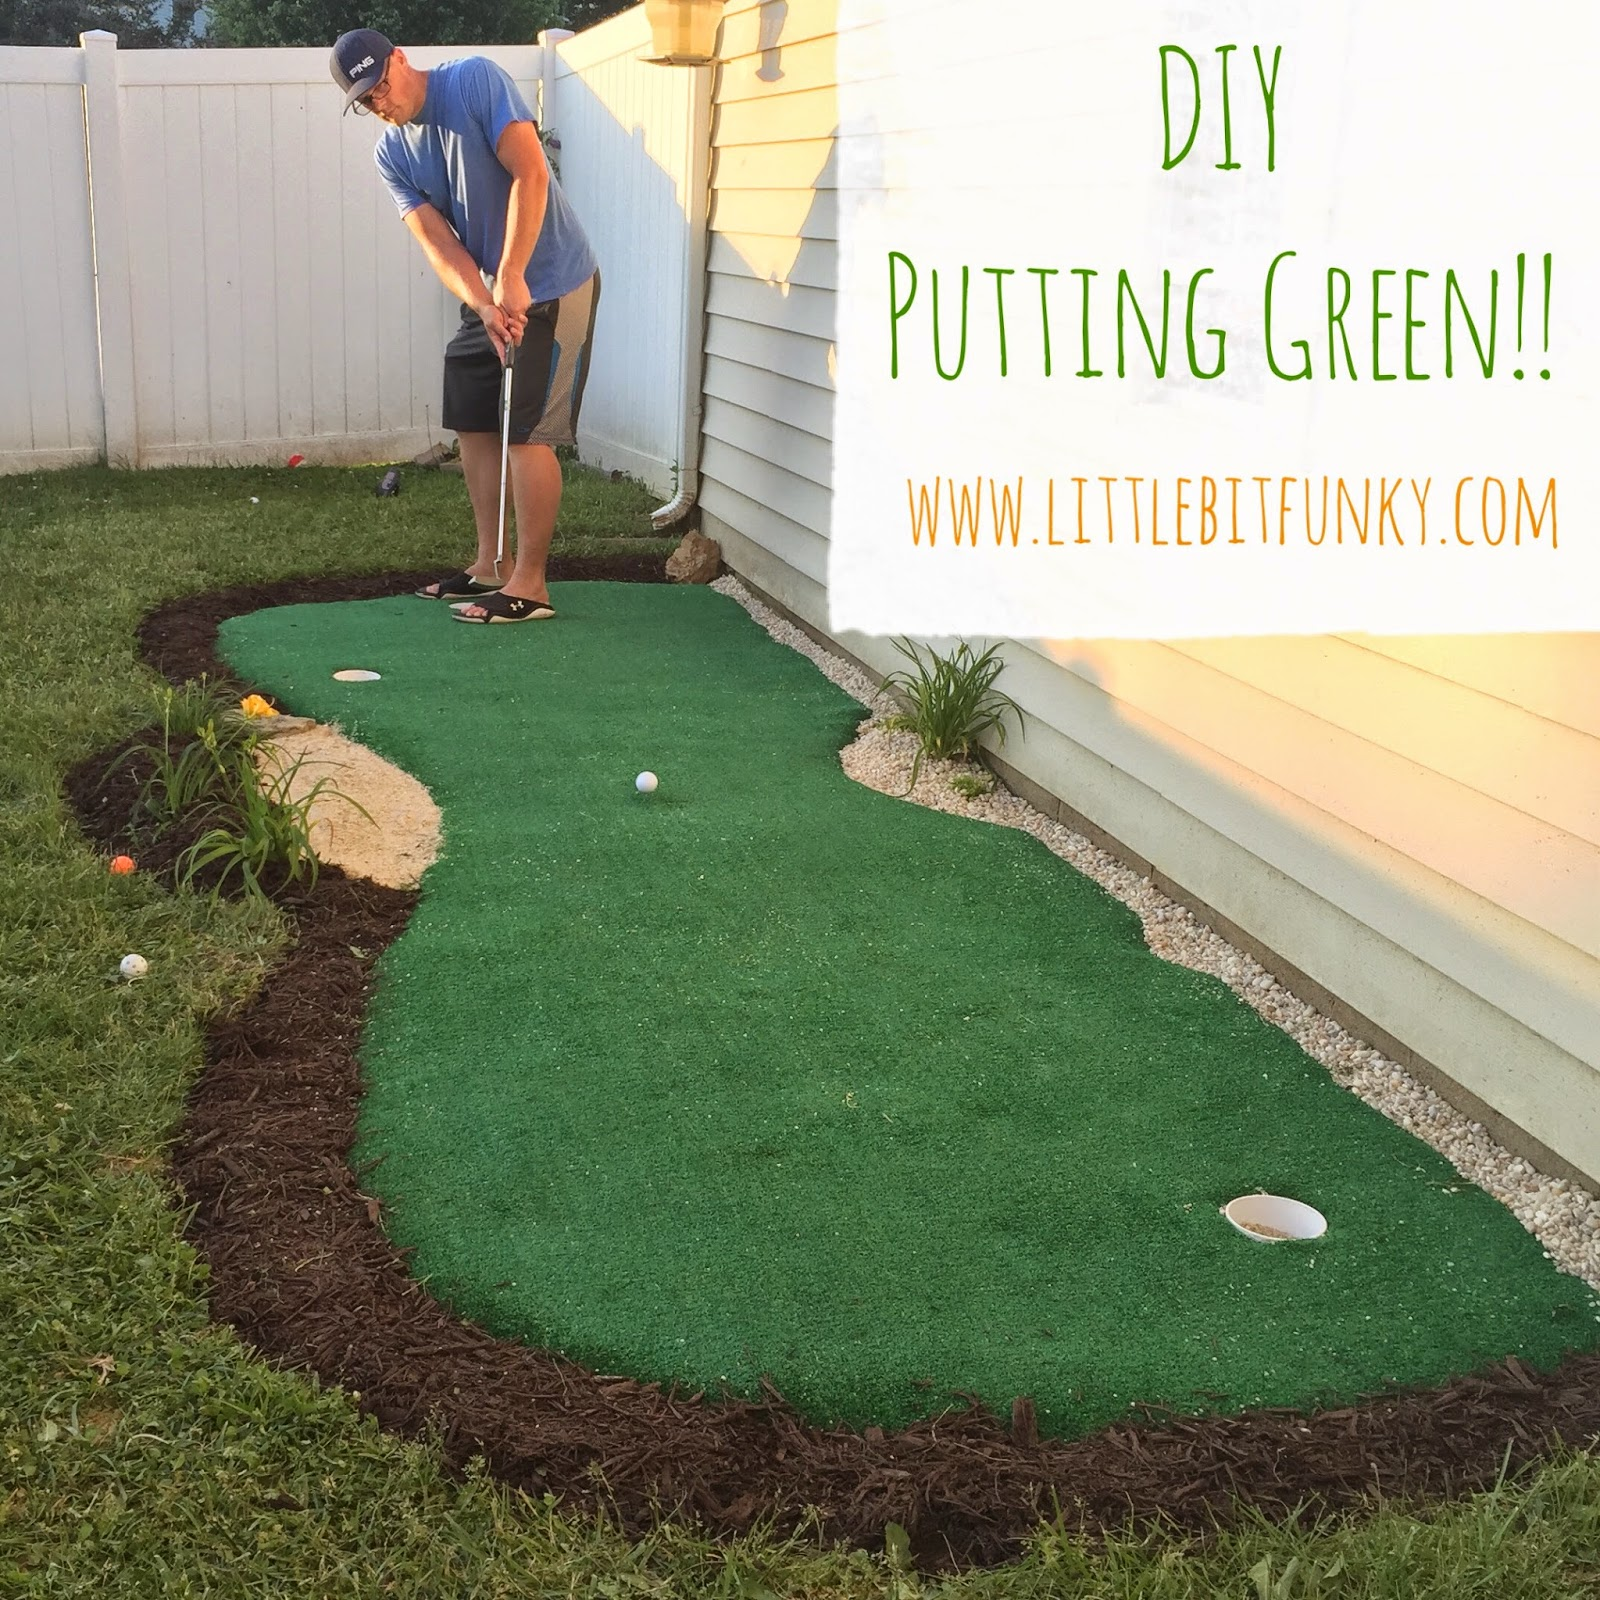 Little Bit Funky: How to make a backyard putting green ... on Putting Green Ideas For Backyard id=30891